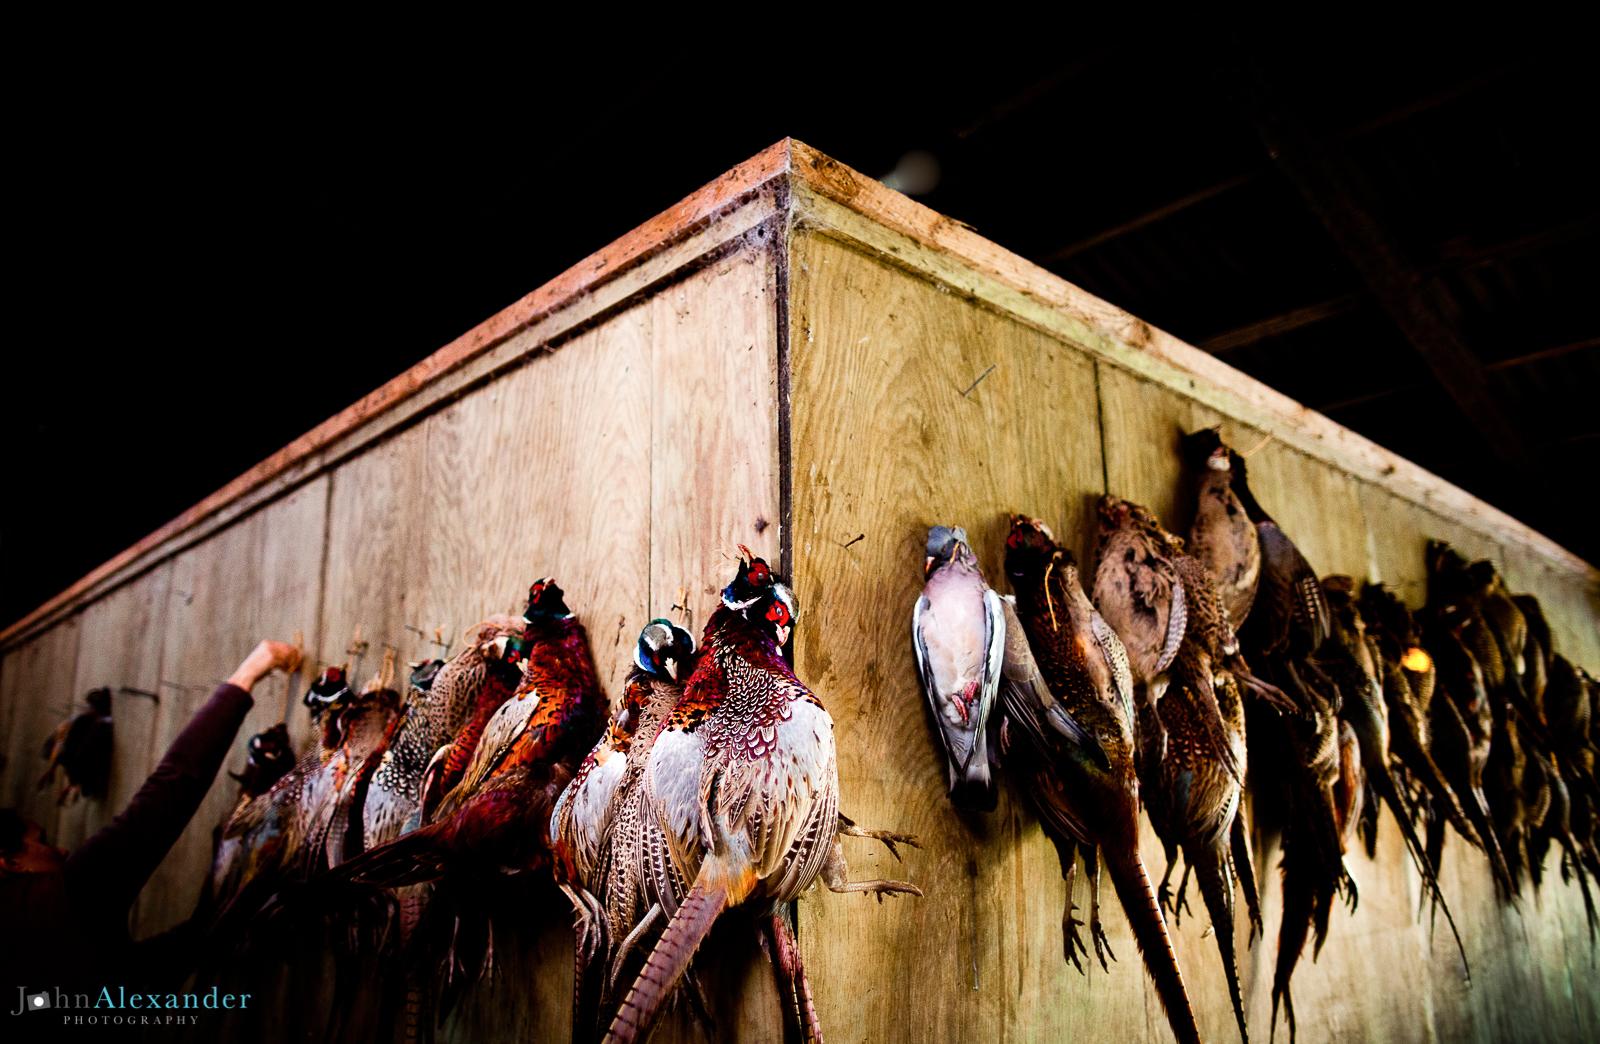 shot pheasants hanging in a barn